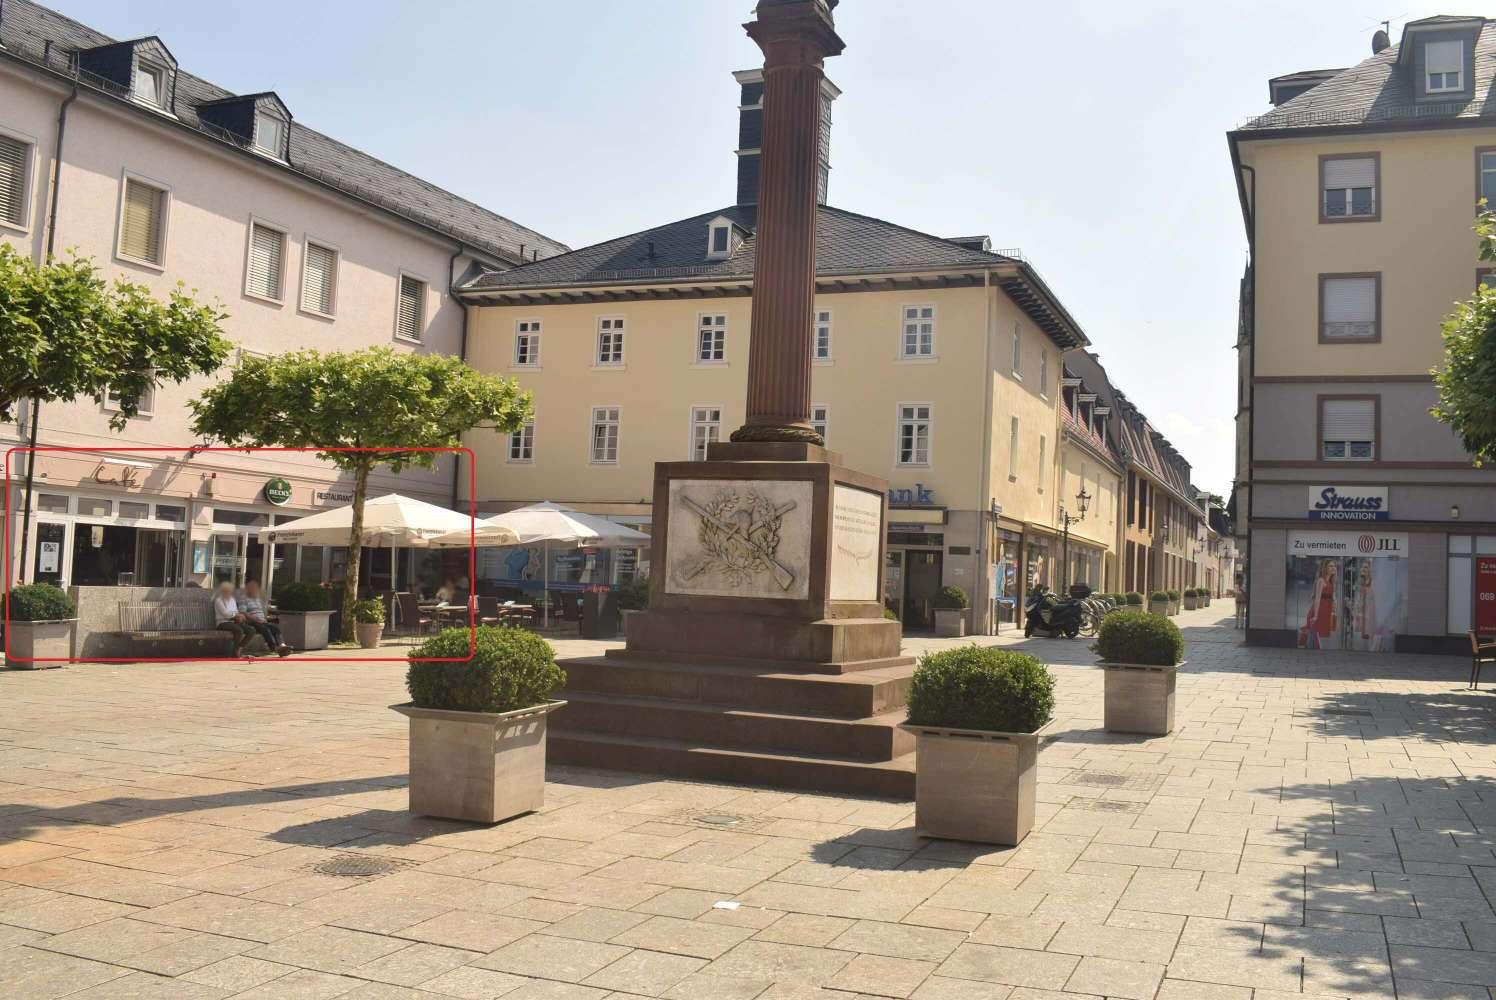 Ladenflächen Bad homburg, 61348 - Ladenfläche - Bad Homburg - E0861 - 10341238